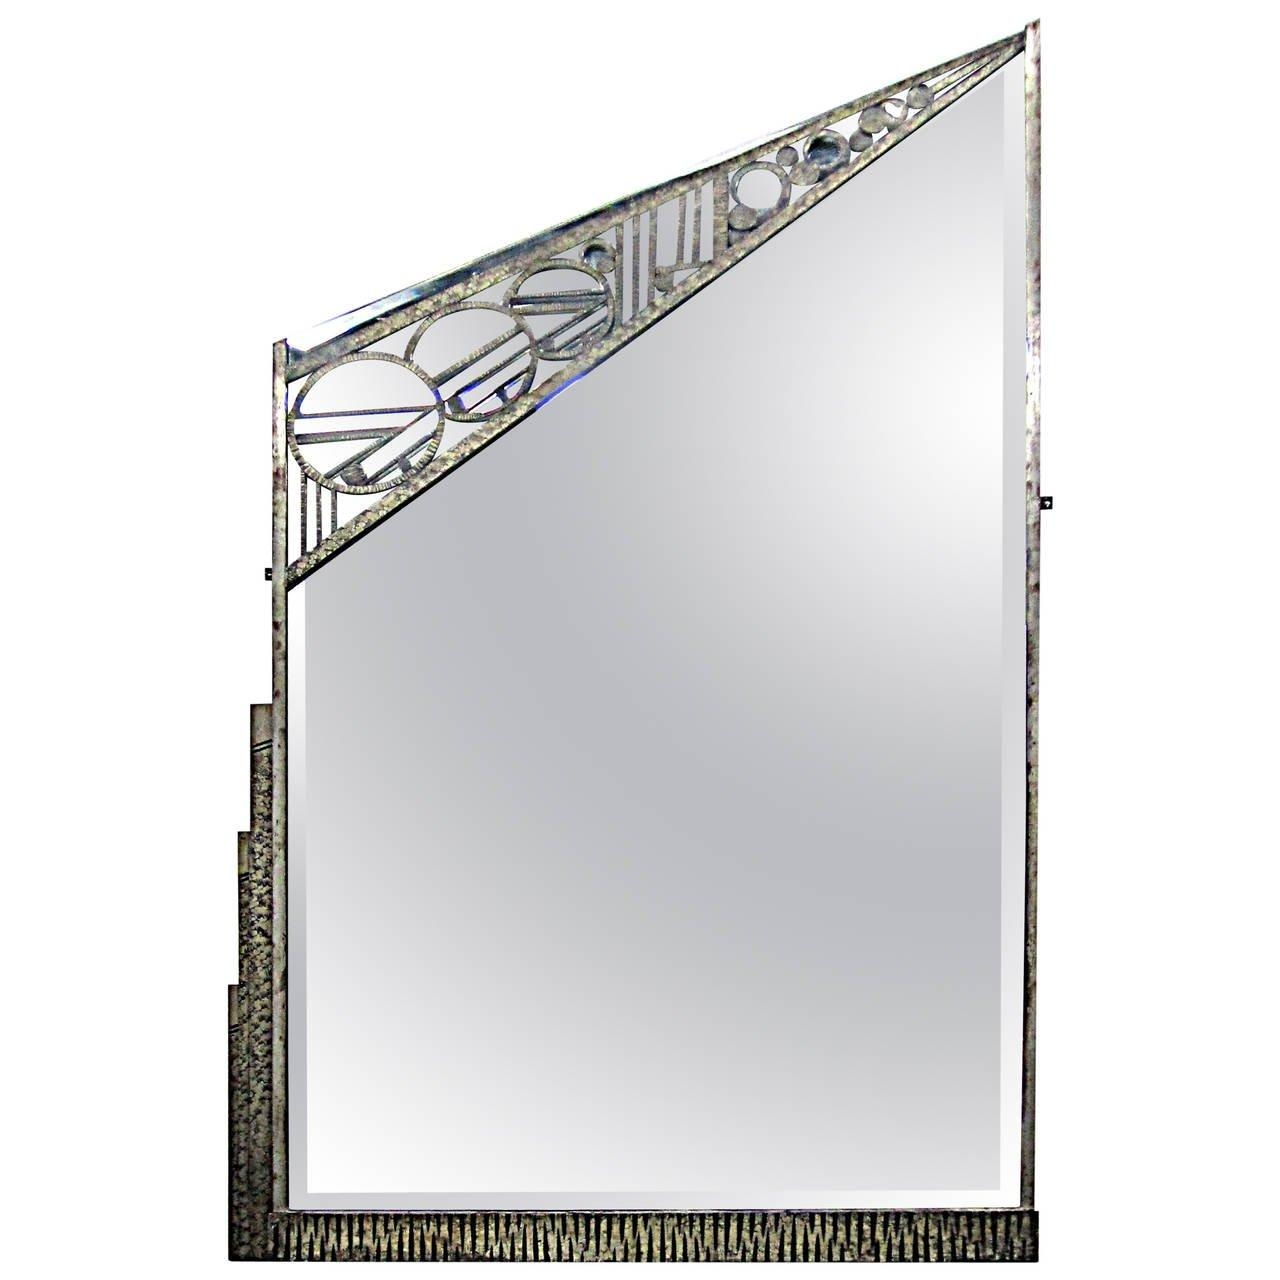 Geometric French Art Deco Wrought Iron Mirrorcharles Piguet Regarding Black Wrought Iron Mirrors (View 19 of 20)